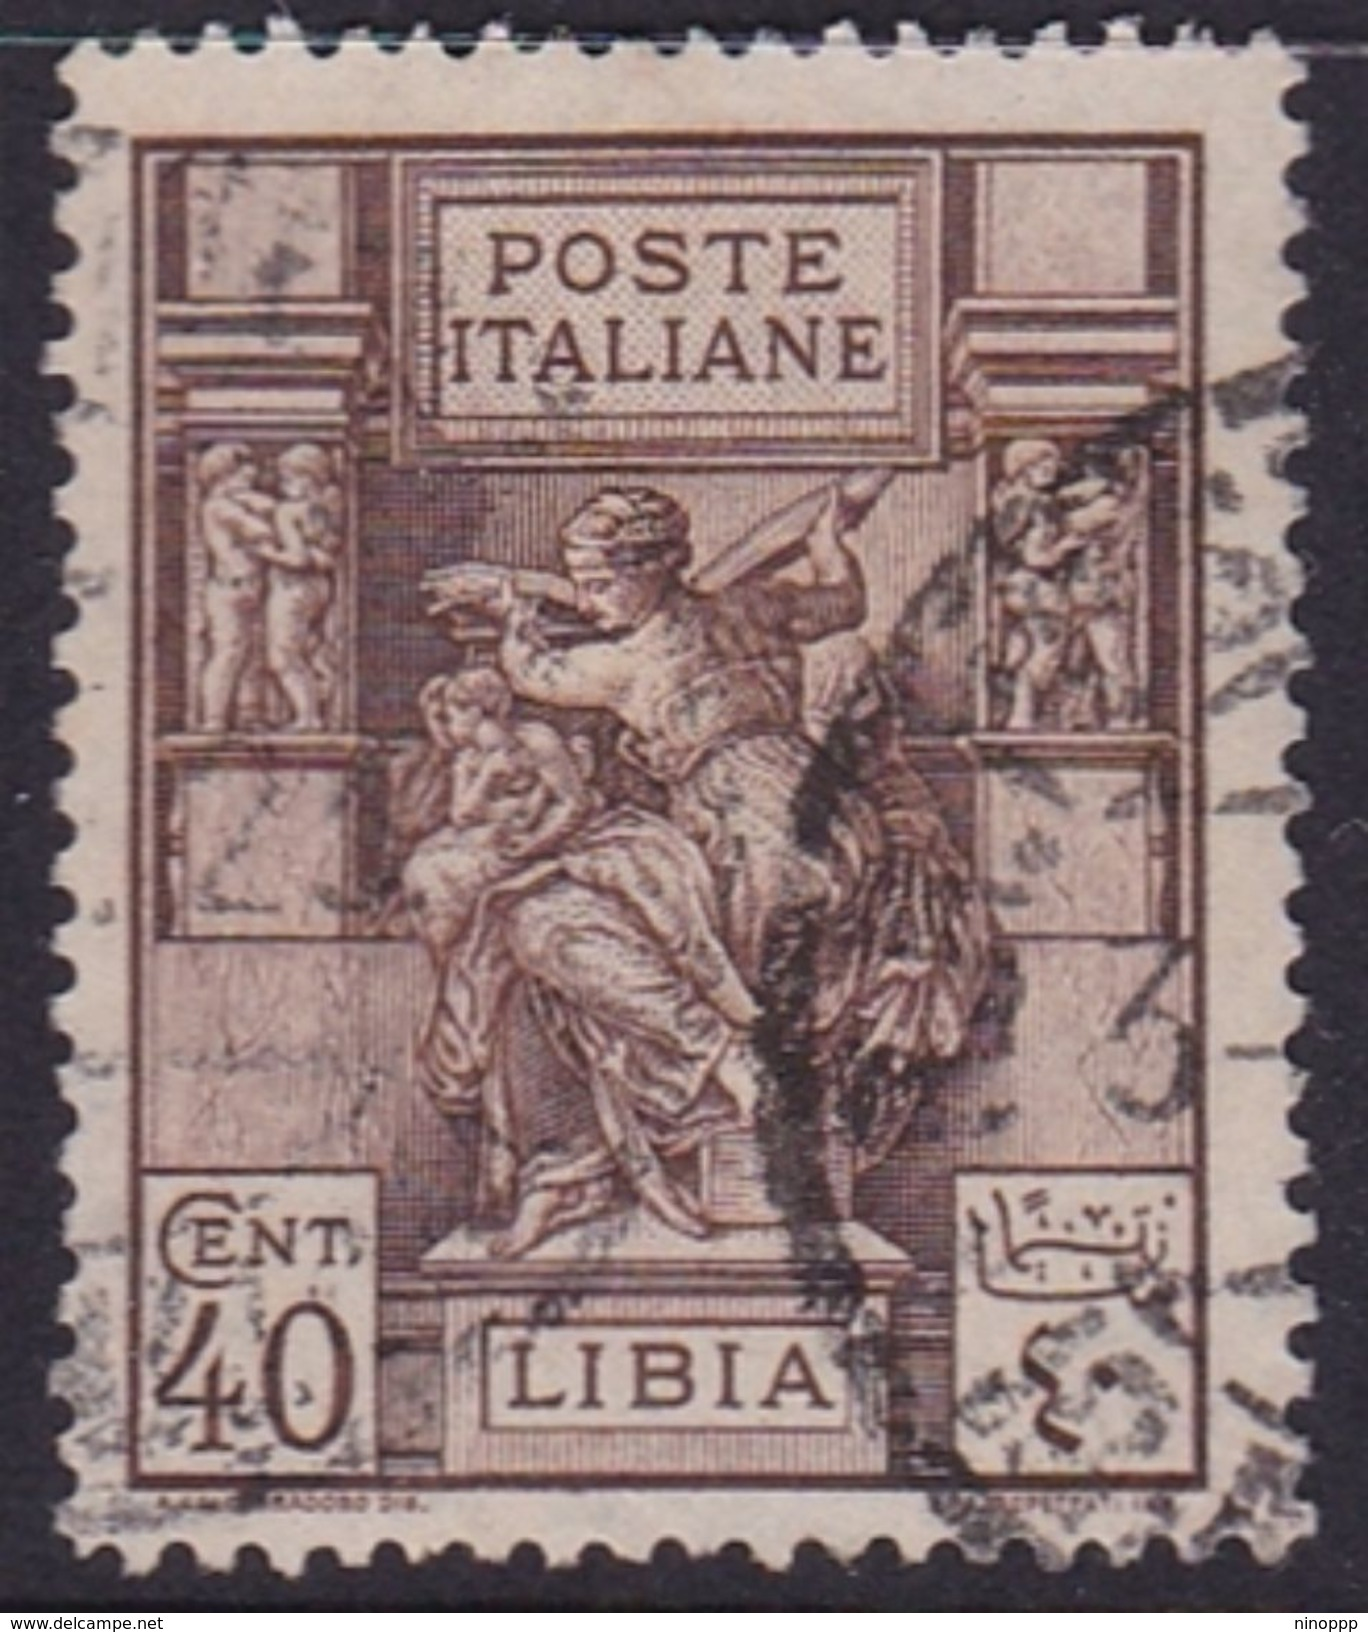 Italy-Colonies And Territories-Libya S 41 1924 ,Libyan Sibyl,40c Brown Used - Libya